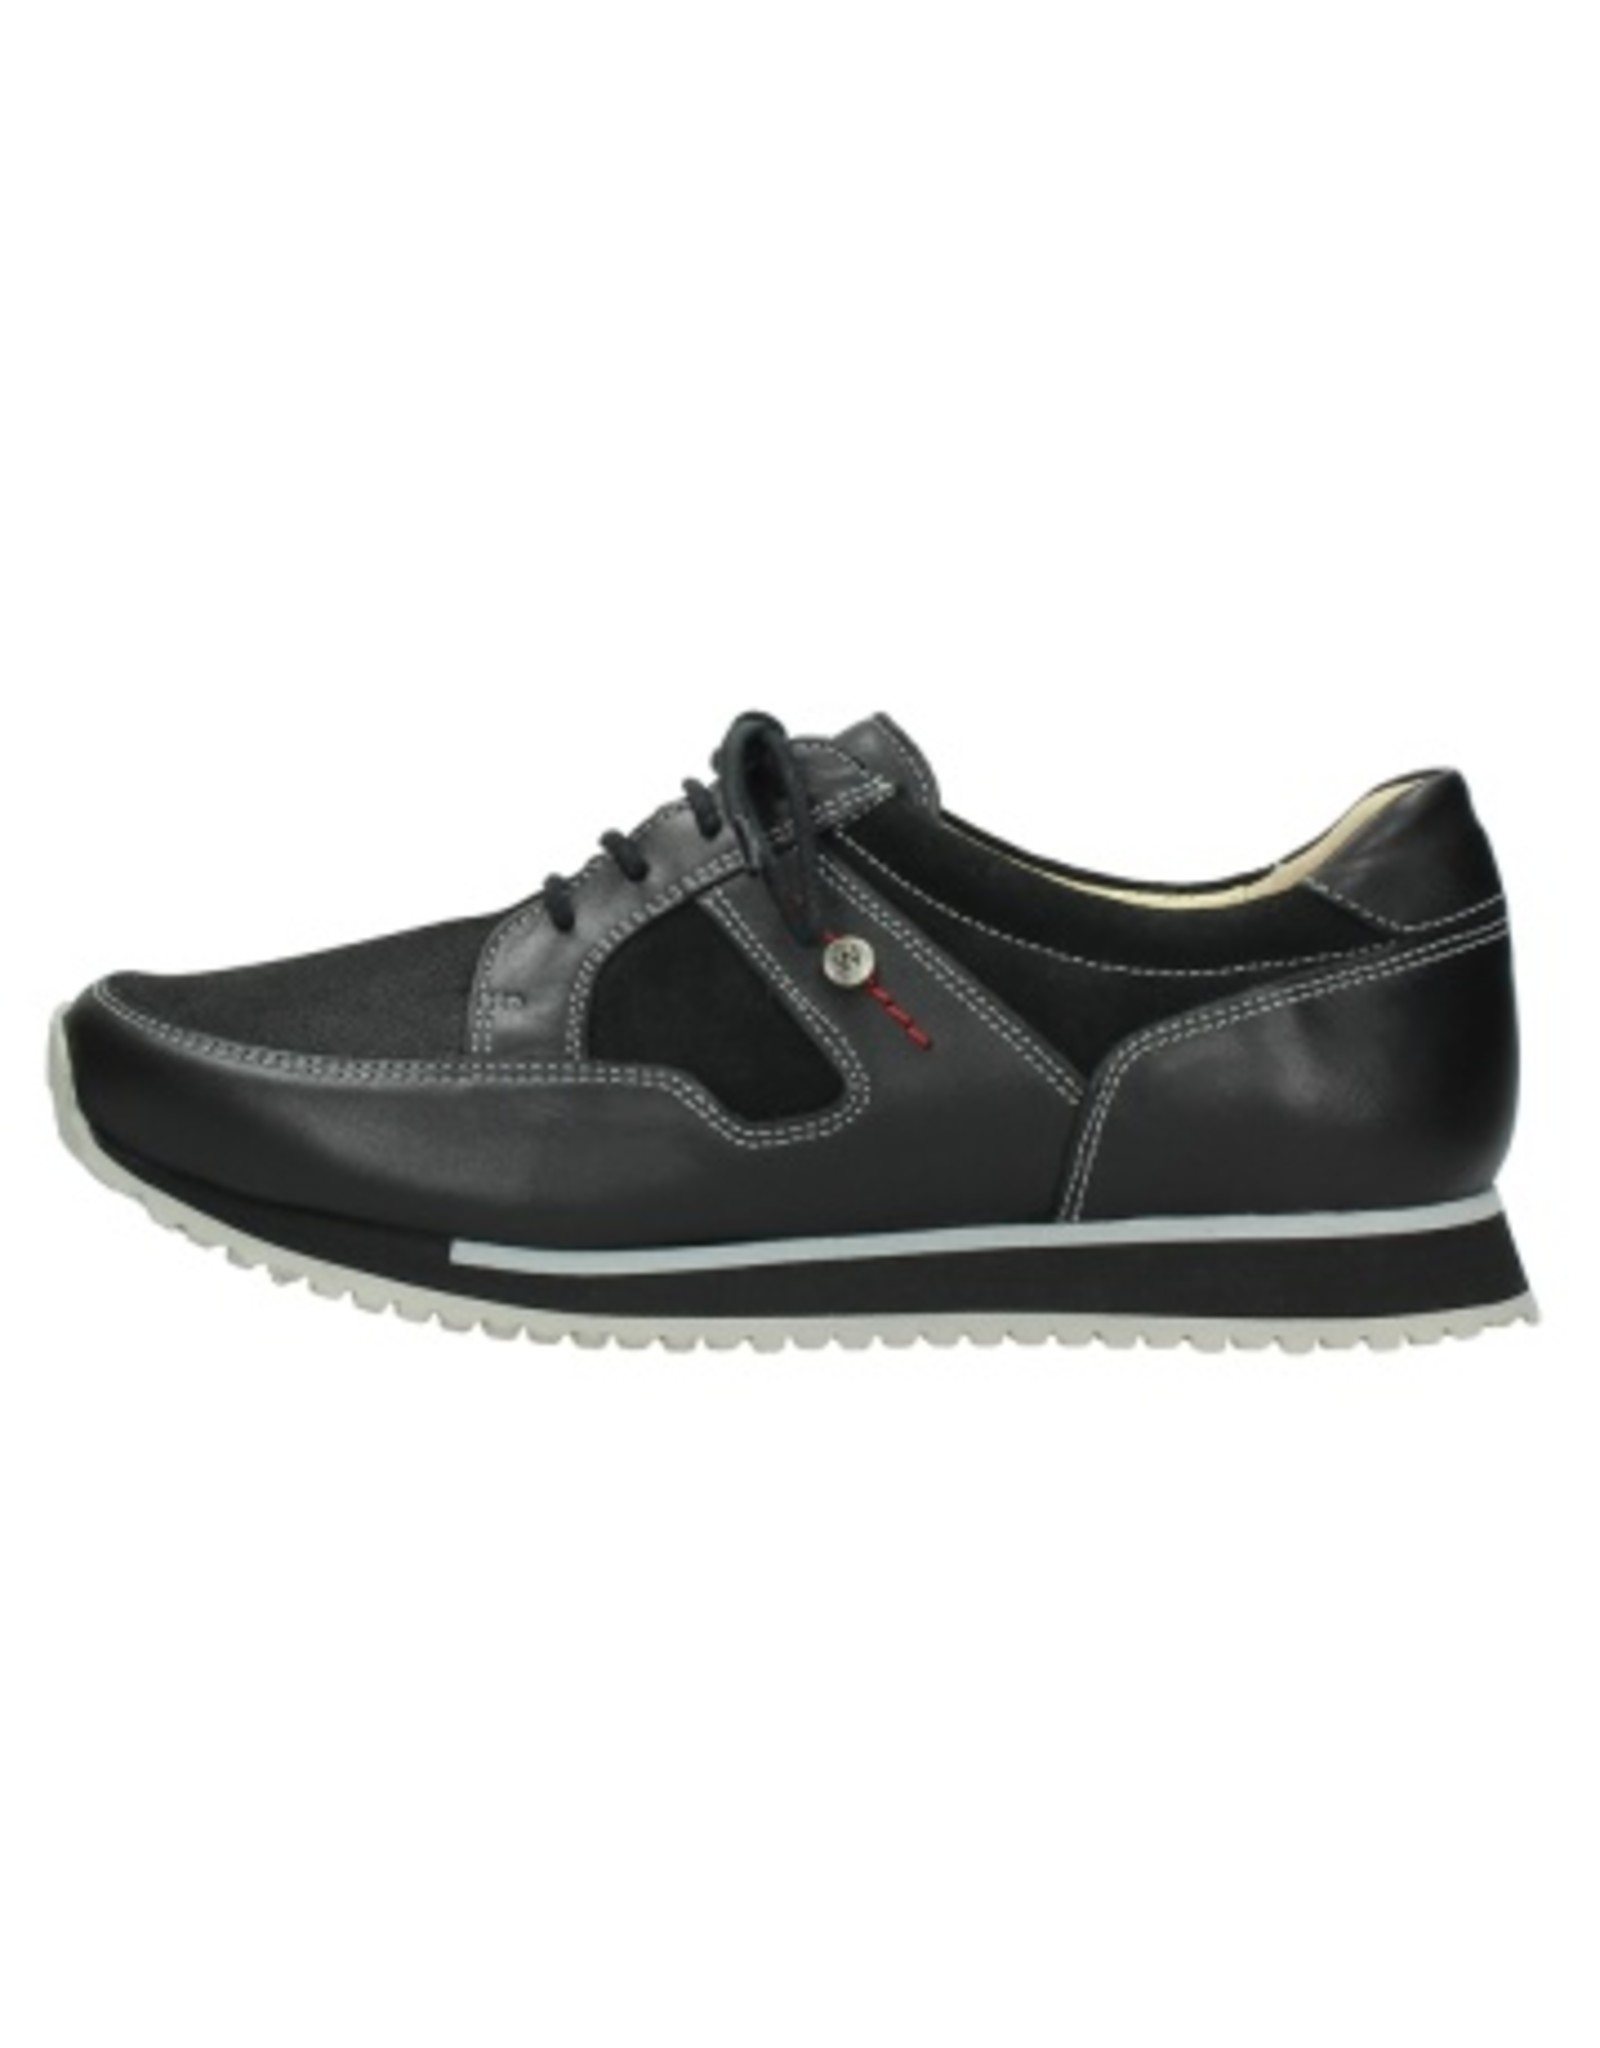 e walk shoes